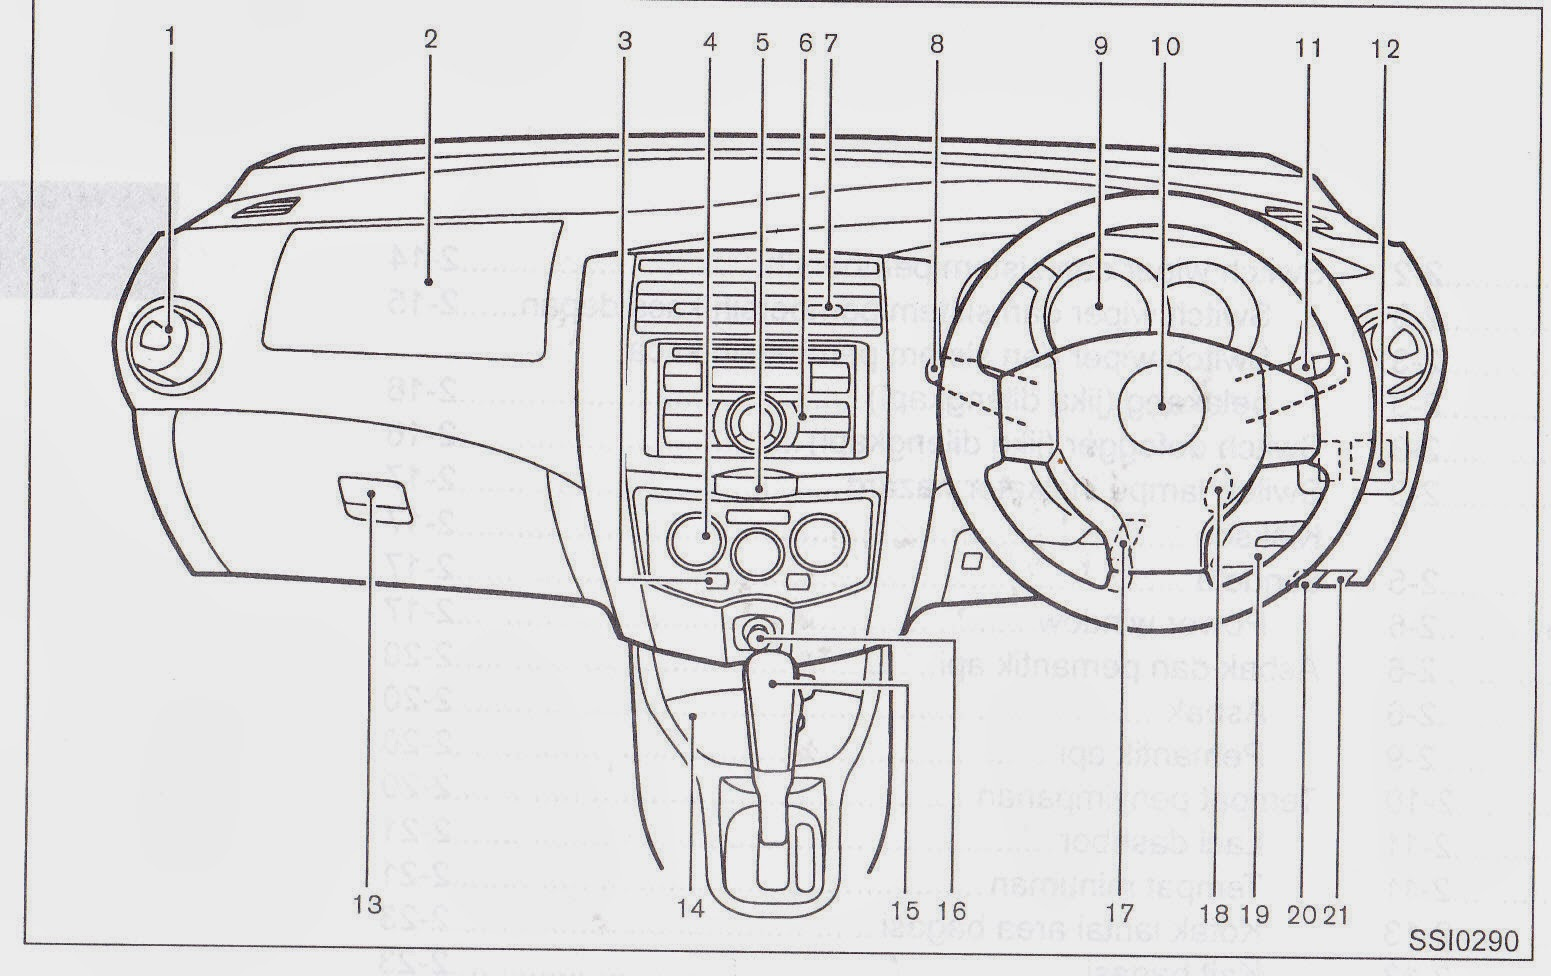 Buku Manual Grand New Veloz Toyota Yaris Trd Sportivo Vs Honda Jazz Rs Panduan Nissan Livina 1 8 Xv Maret 2014